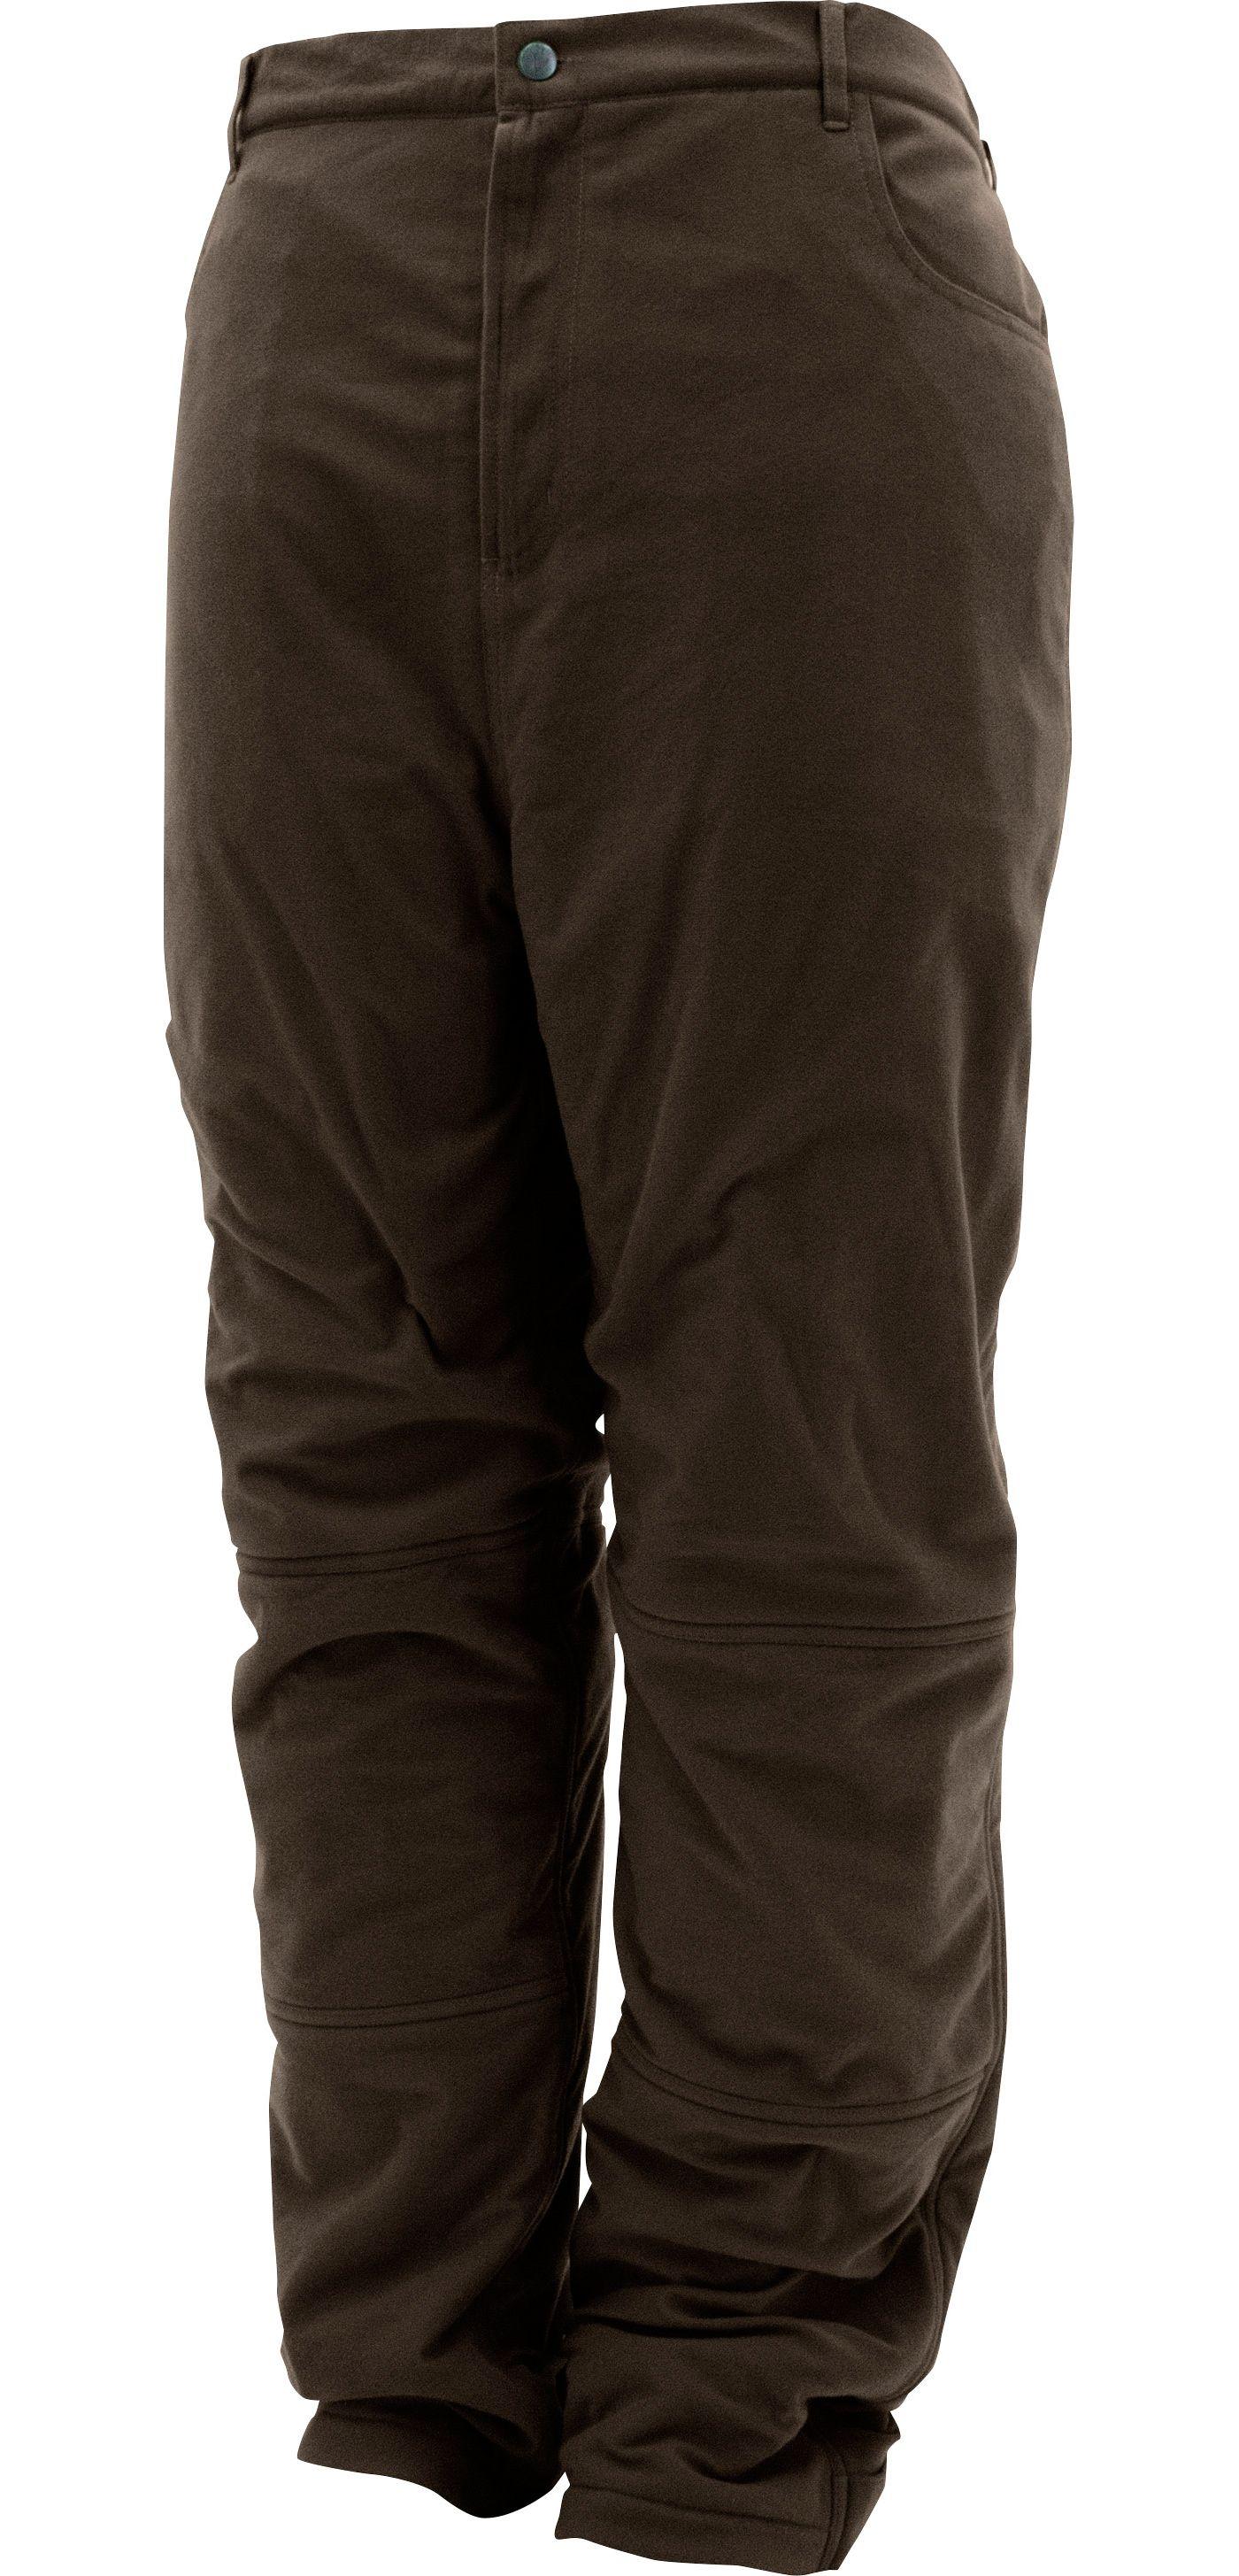 frogg toggs Men's frogg Fleece Lined Wader Pants